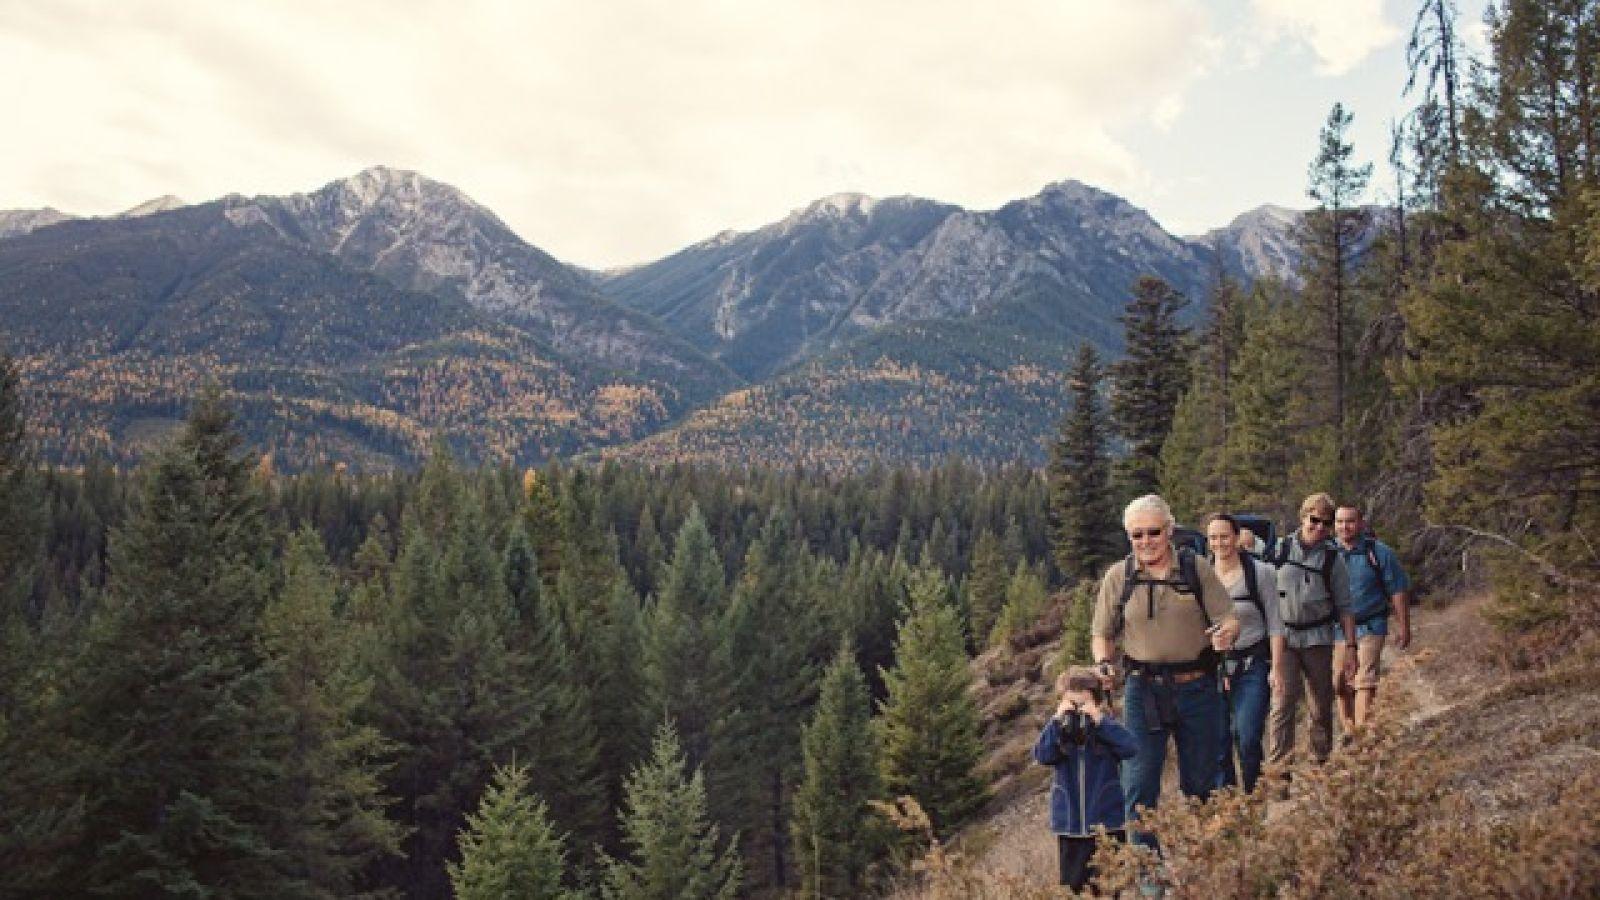 Wonderful hiking trails for everyone.